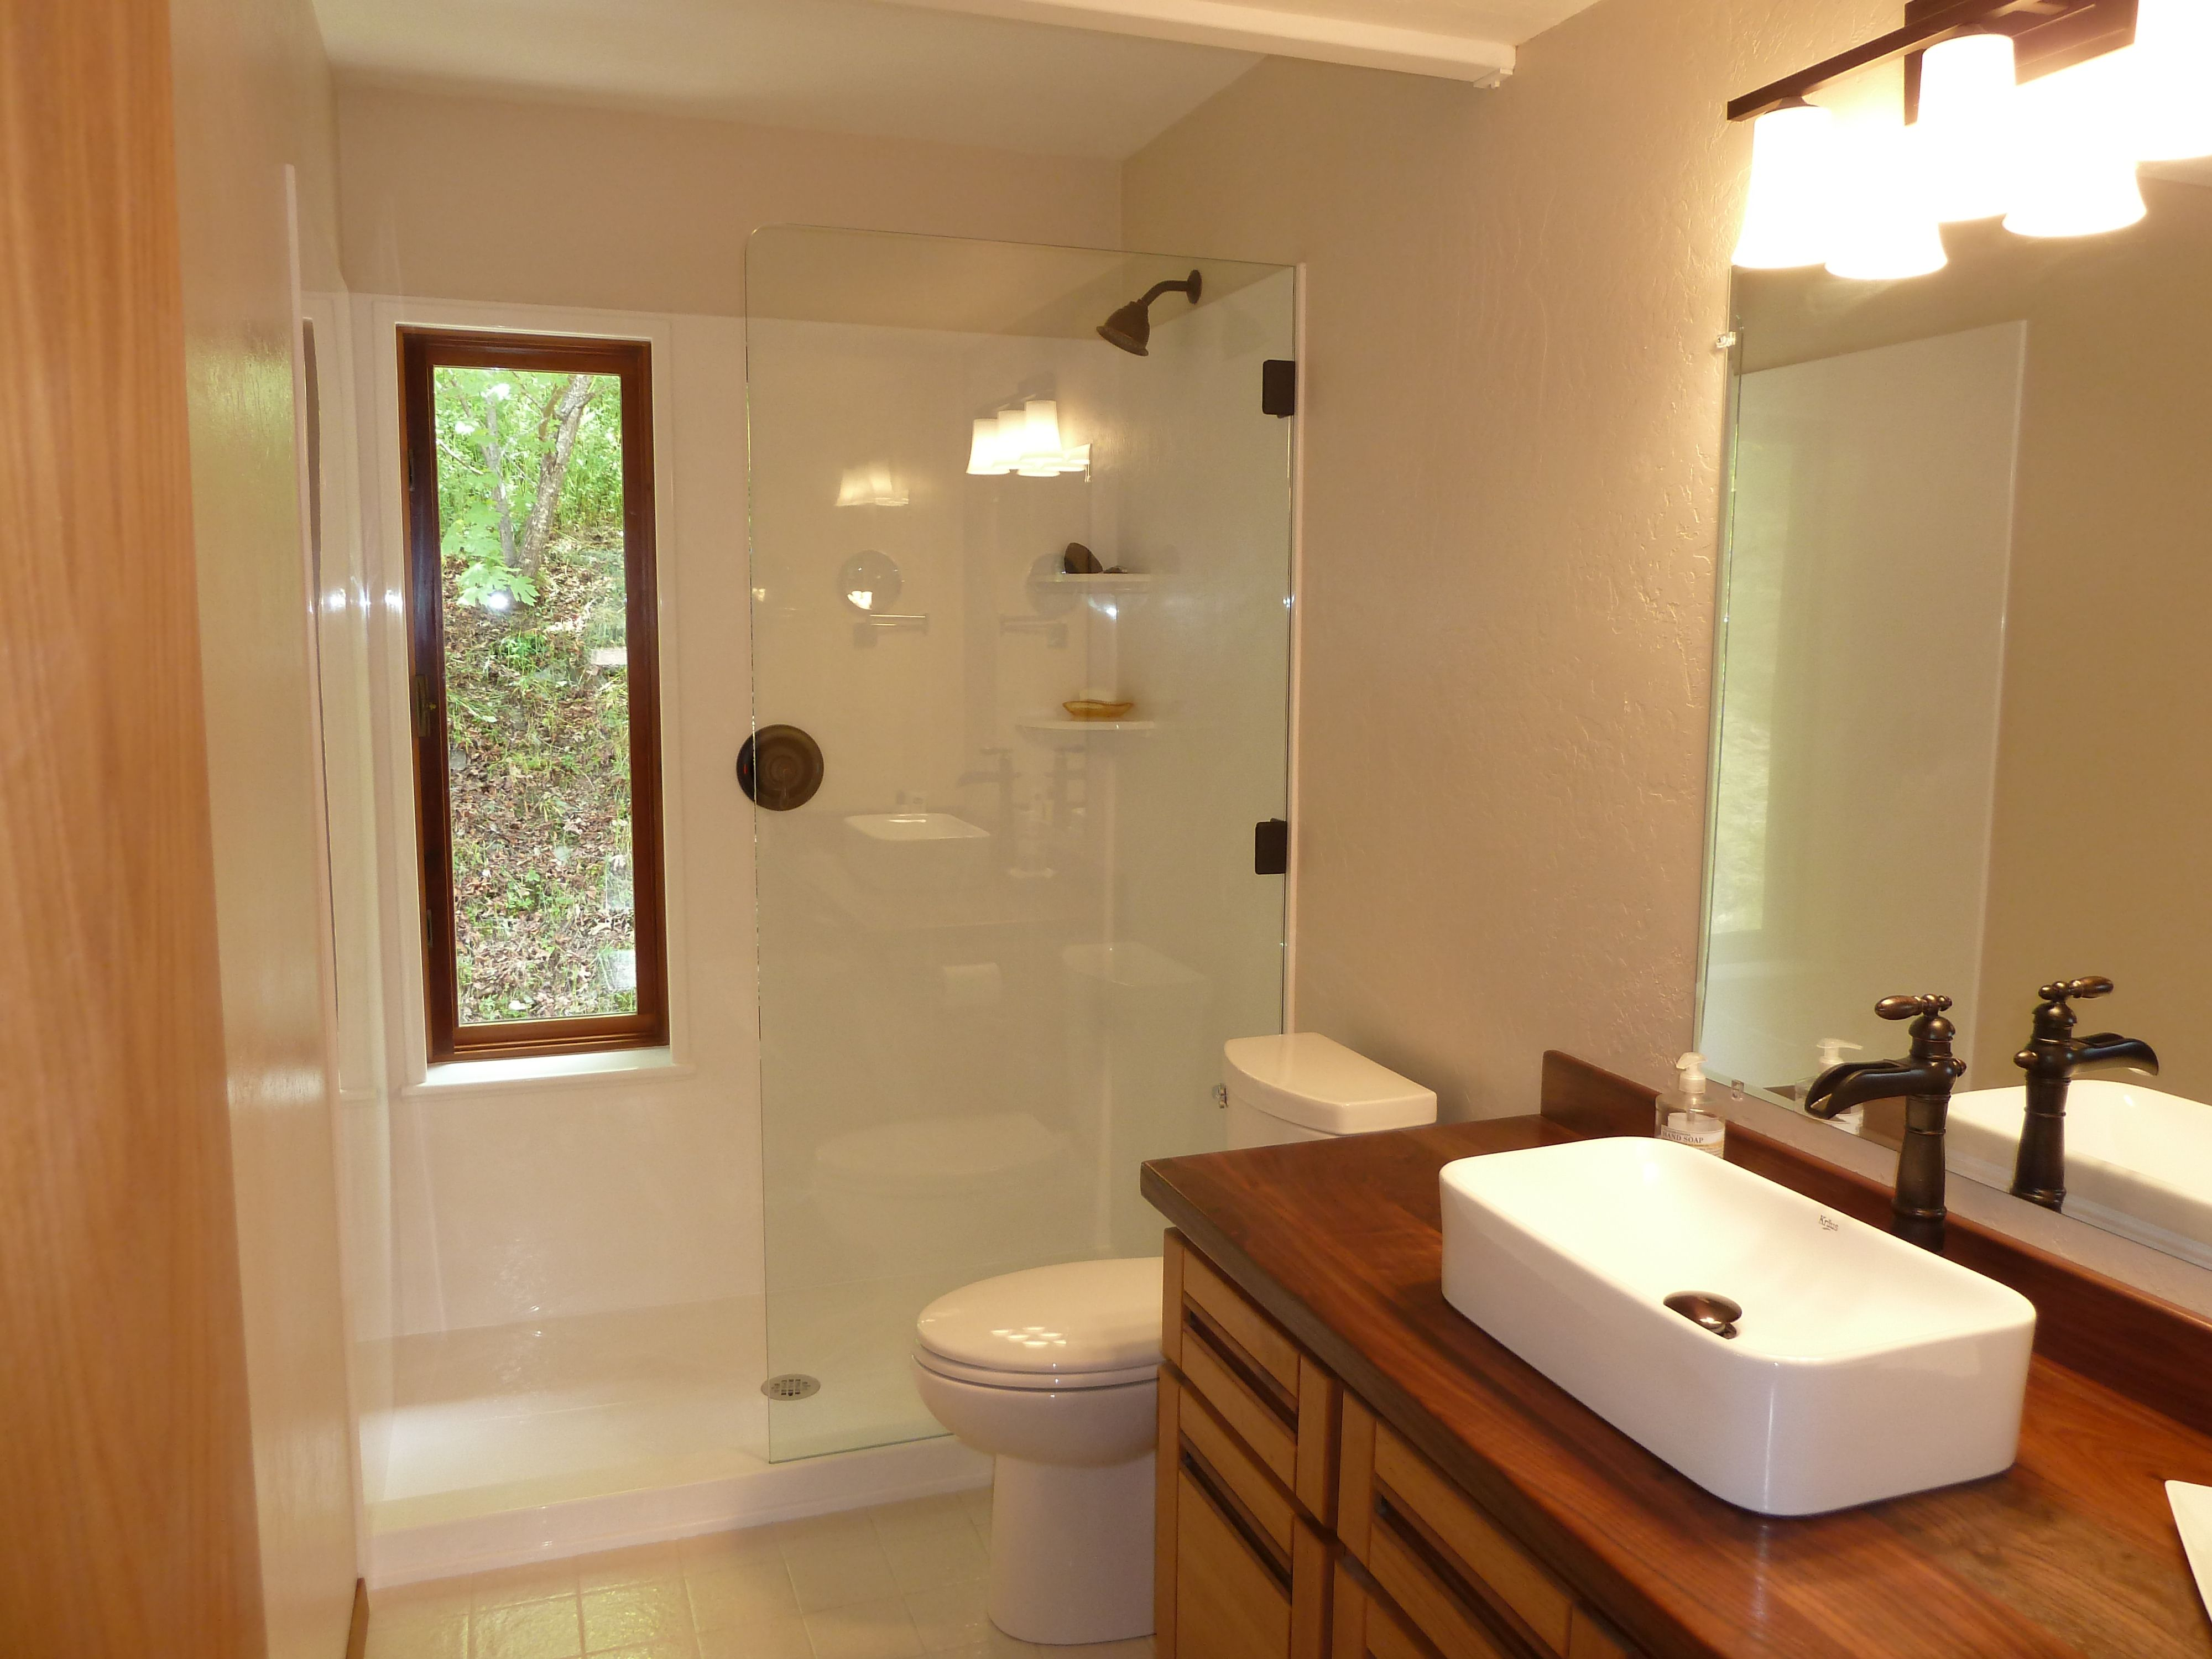 guest bathroom remodel ideas bathroom remodel guest house ideas pinterest